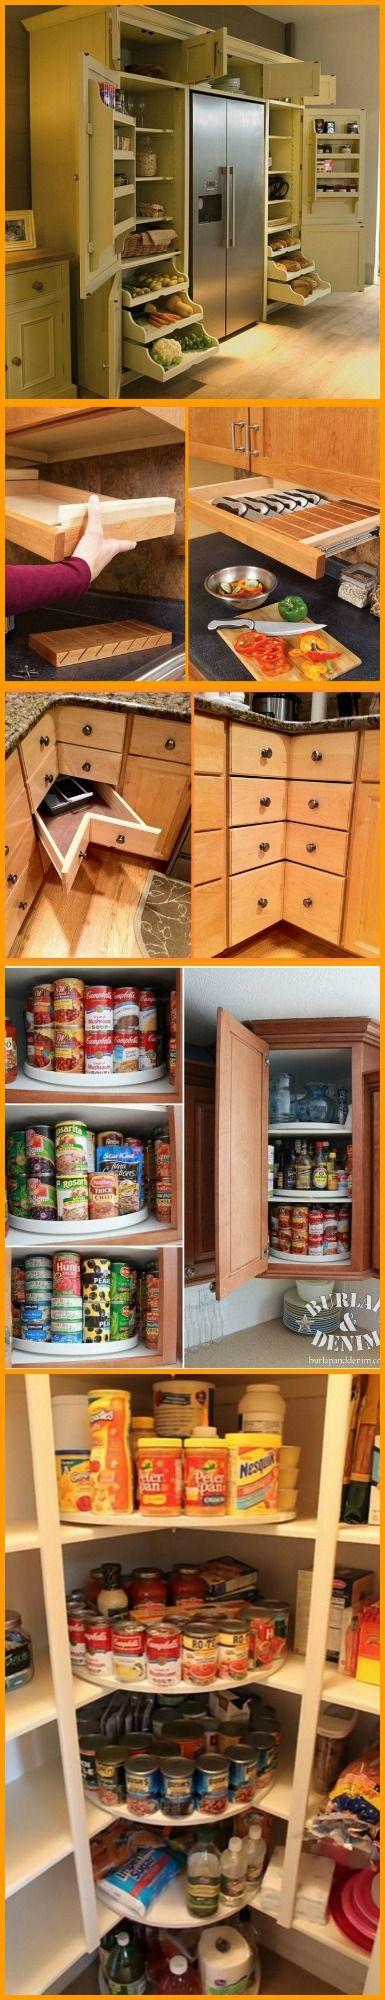 78 best images about kitchen storage on pinterest pot lids diy kitchen storage and how to build on kitchen organization diy id=94596